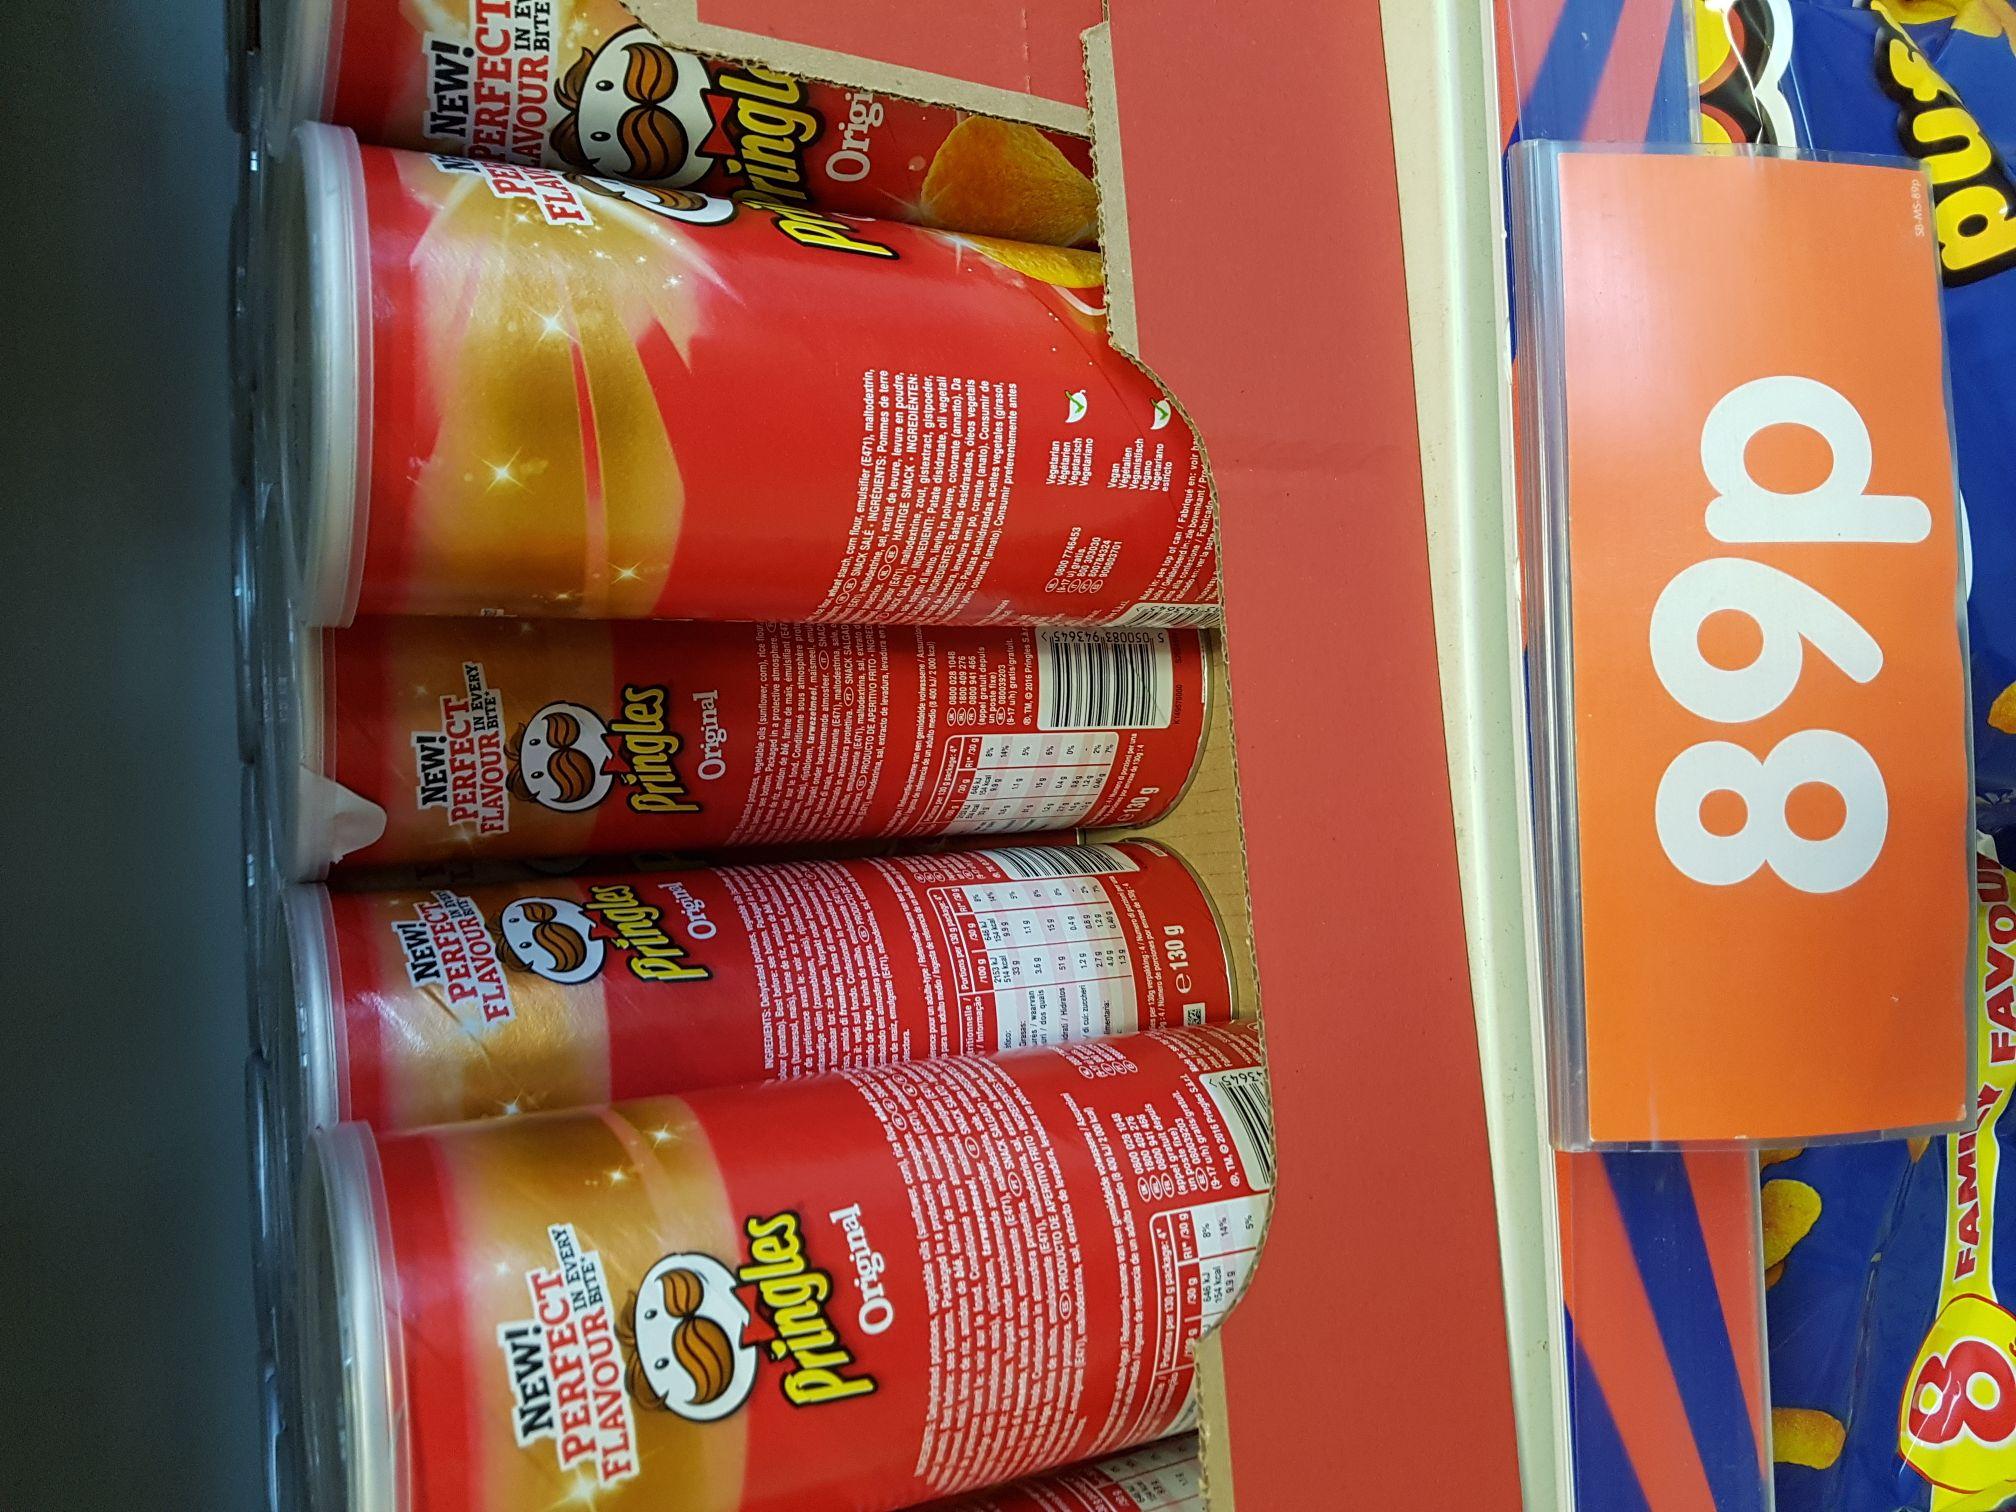 Pringles 130g only 0.89p @ B&M